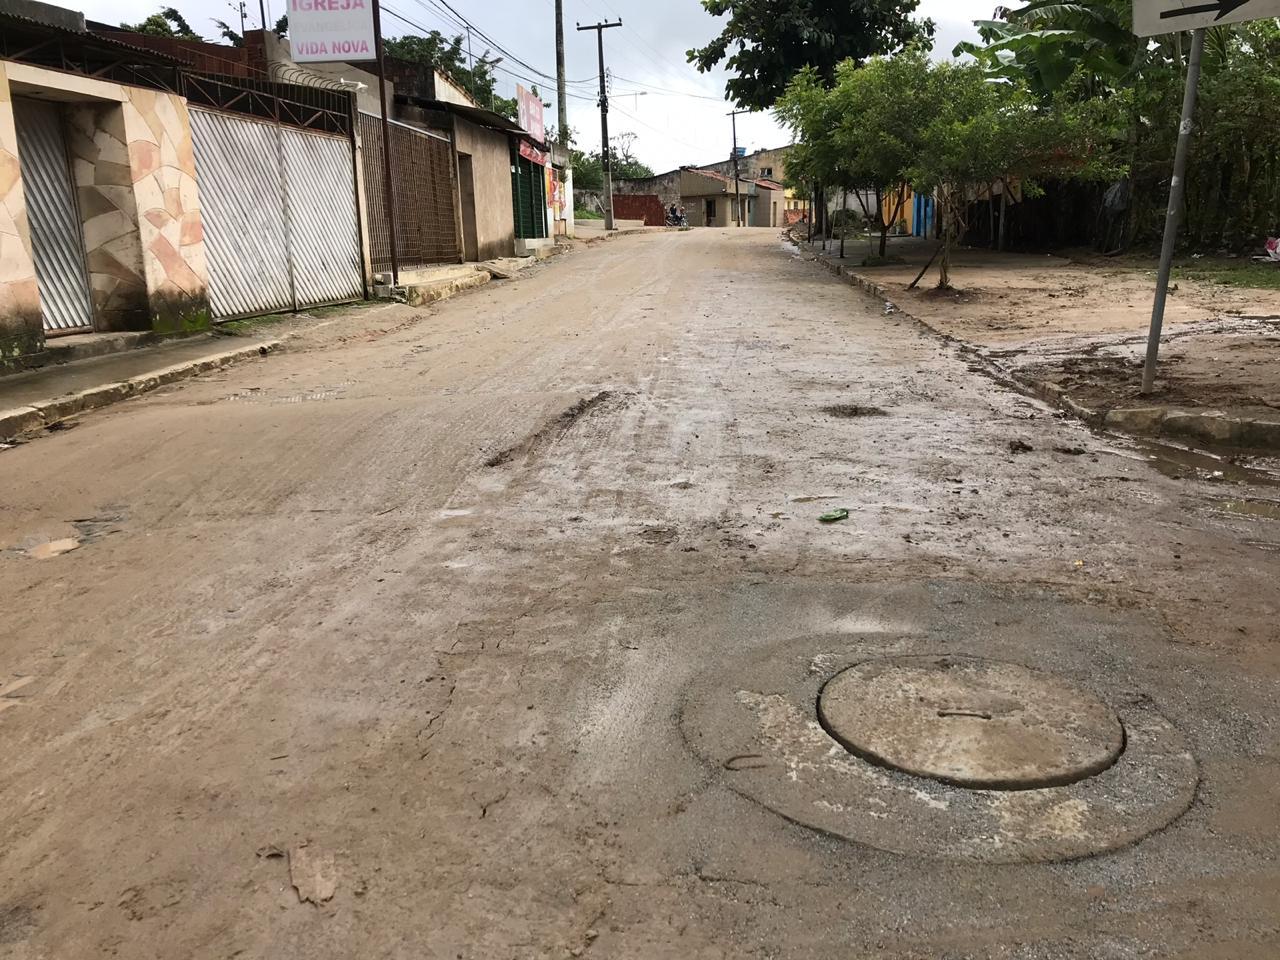 https://caruaru.pe.gov.br/wp-content/uploads/2020/01/foto-4-1.jpeg